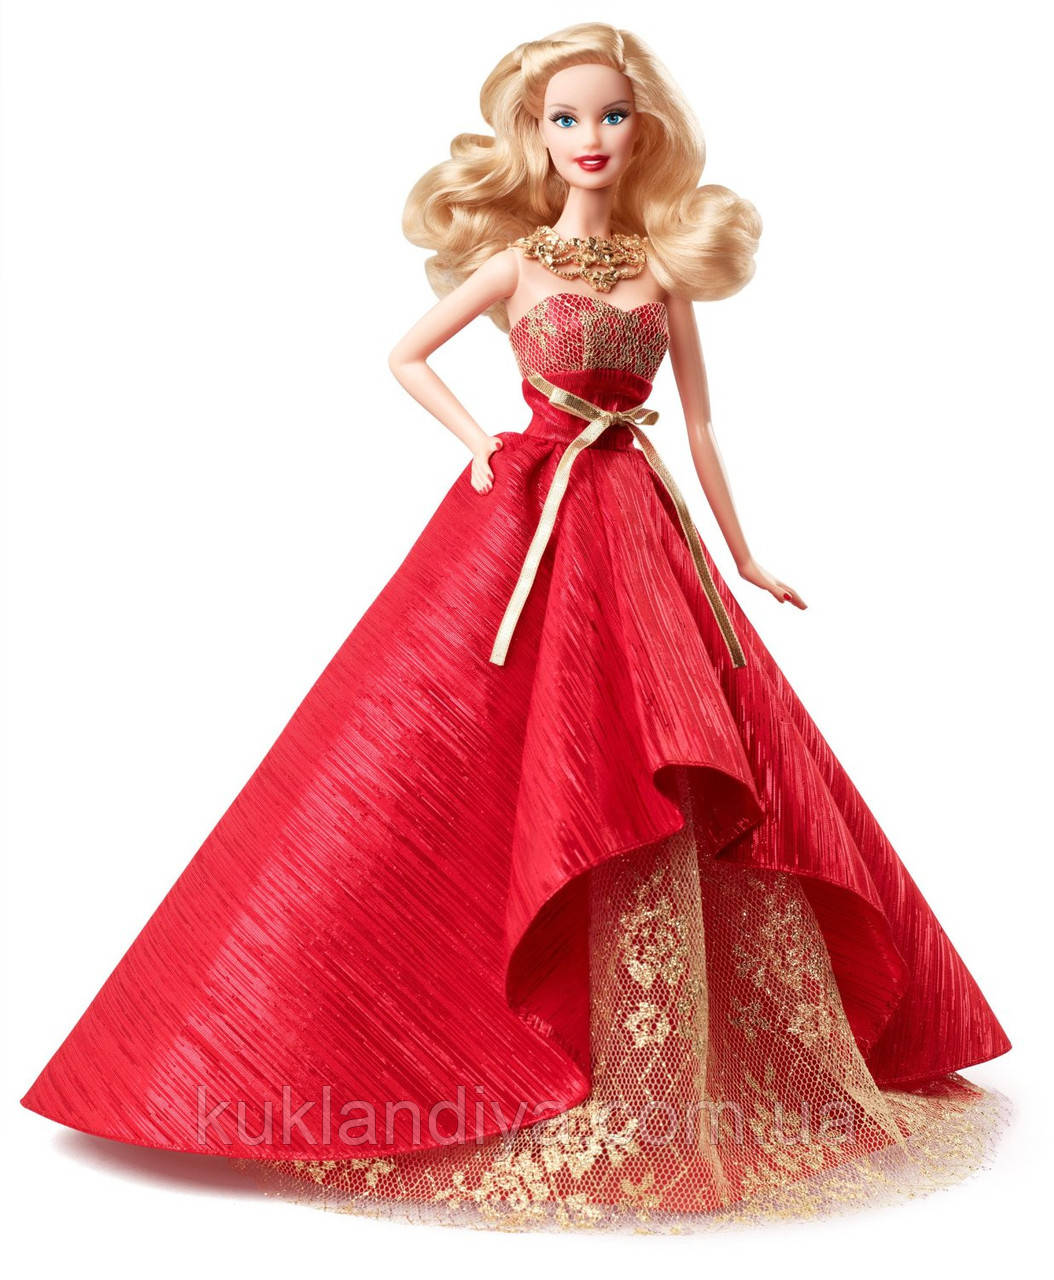 Кукла Barbie Collector 2014 Holiday Коллекционная